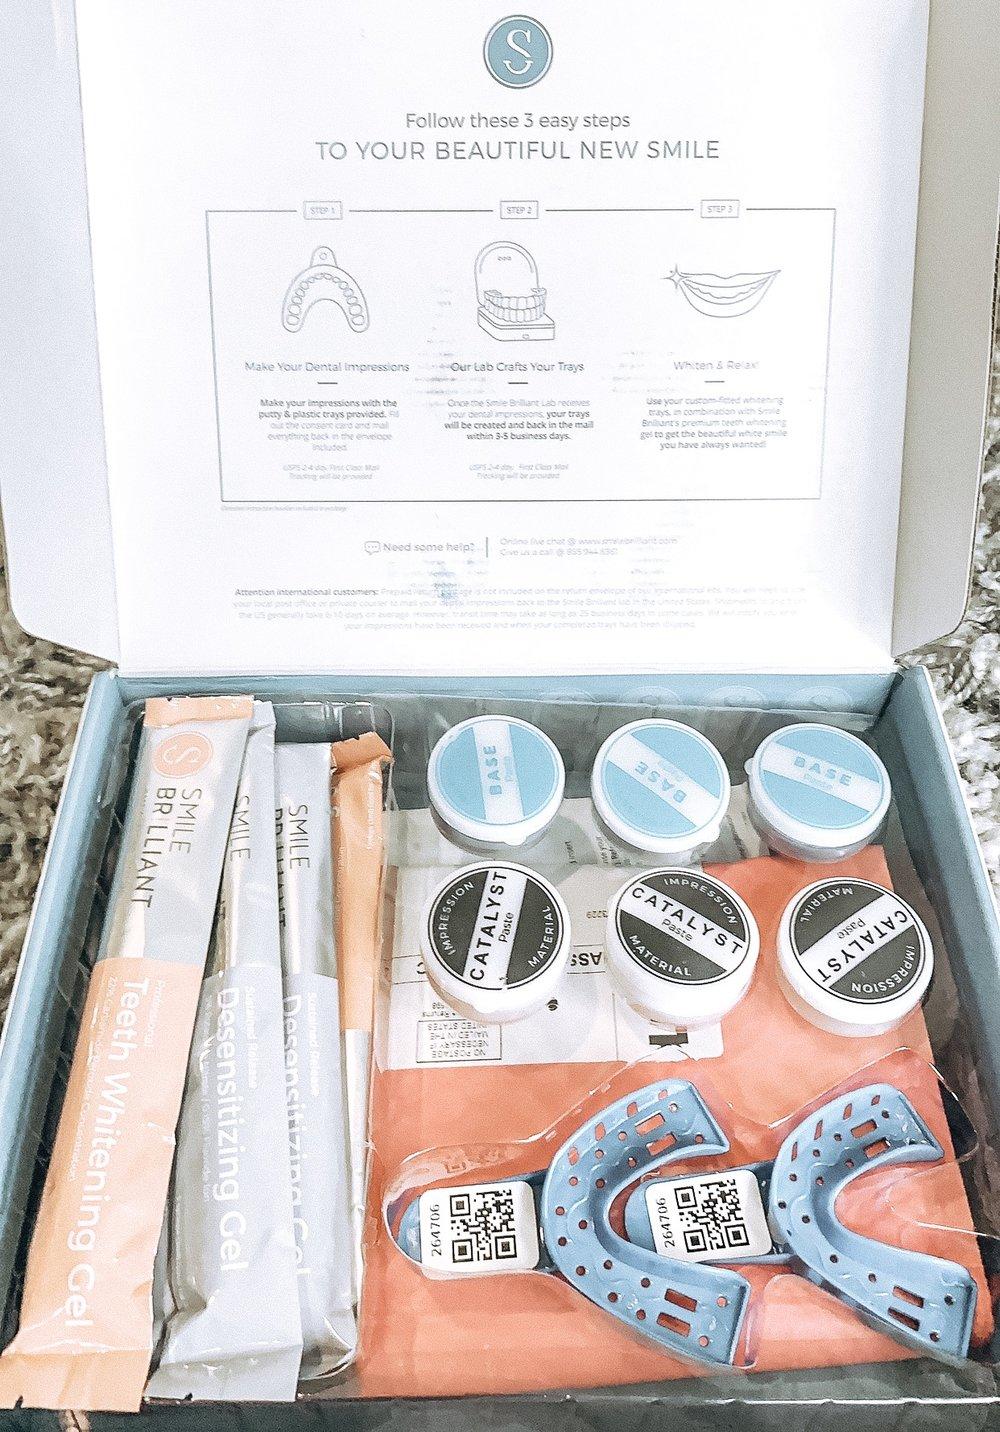 - -Impression Kit-Impression case-Whitening Gel-Desensitizing Gel-Detailed Instructions